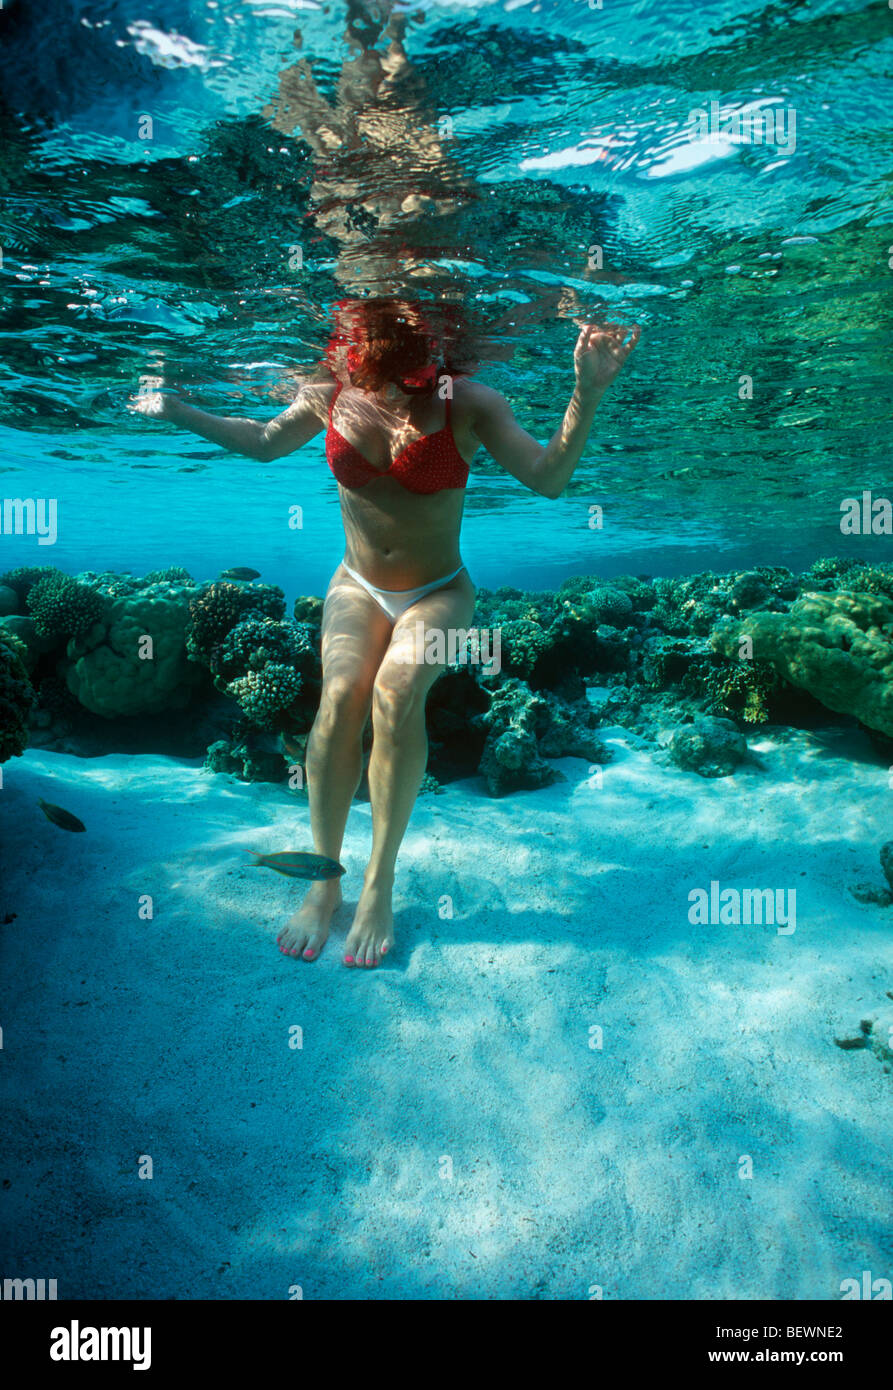 Free diver explores coral reef. Sinai, Egypt - Red Sea - Stock Image